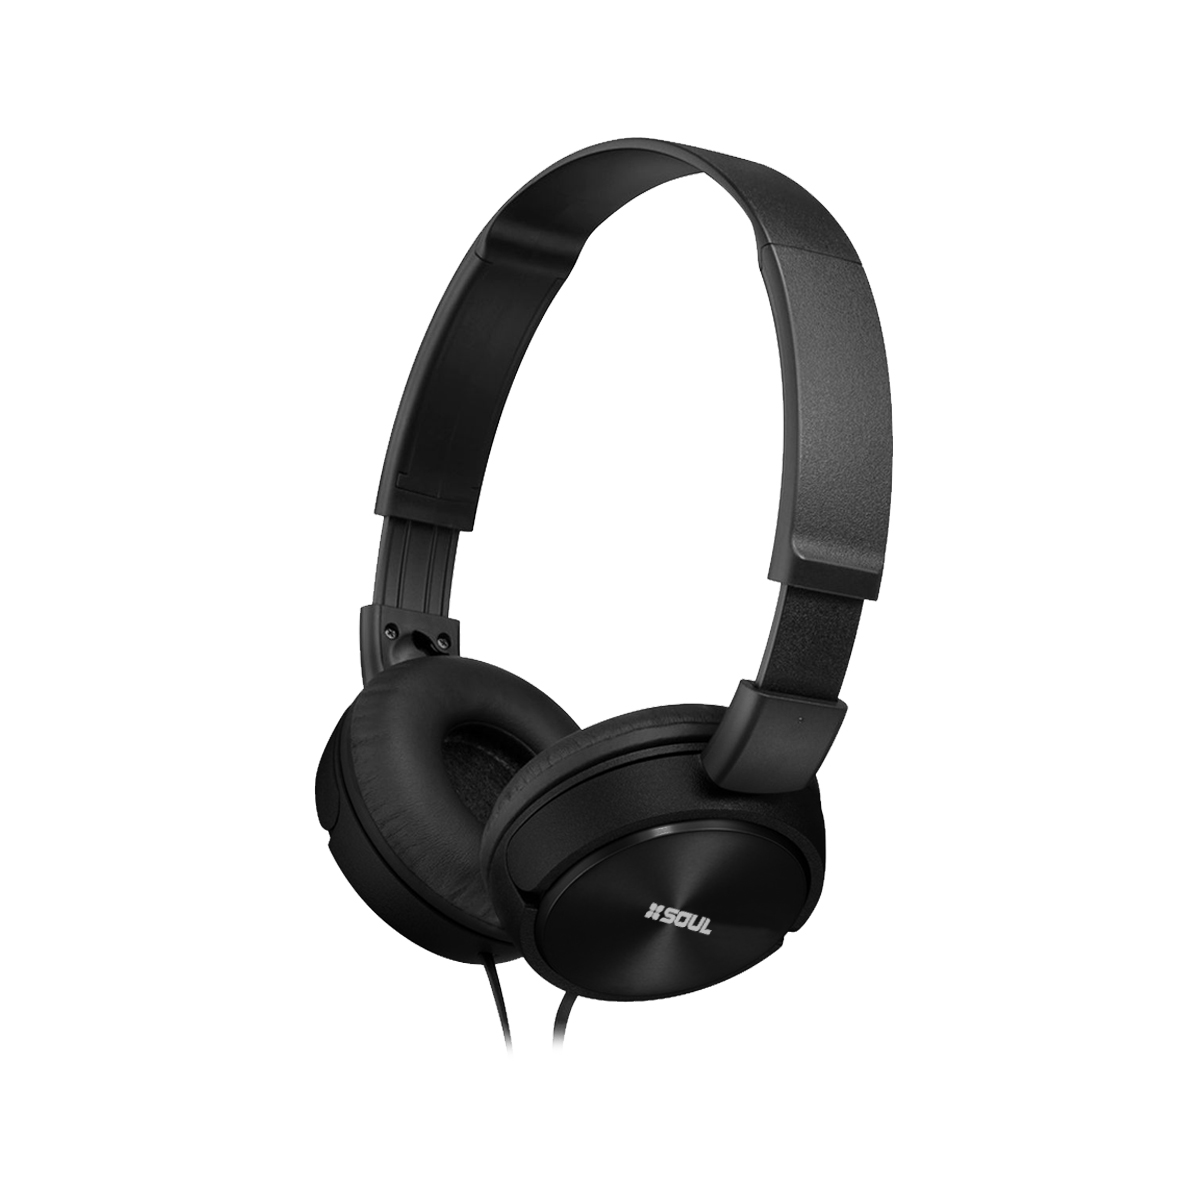 Auriculares REBEL S900